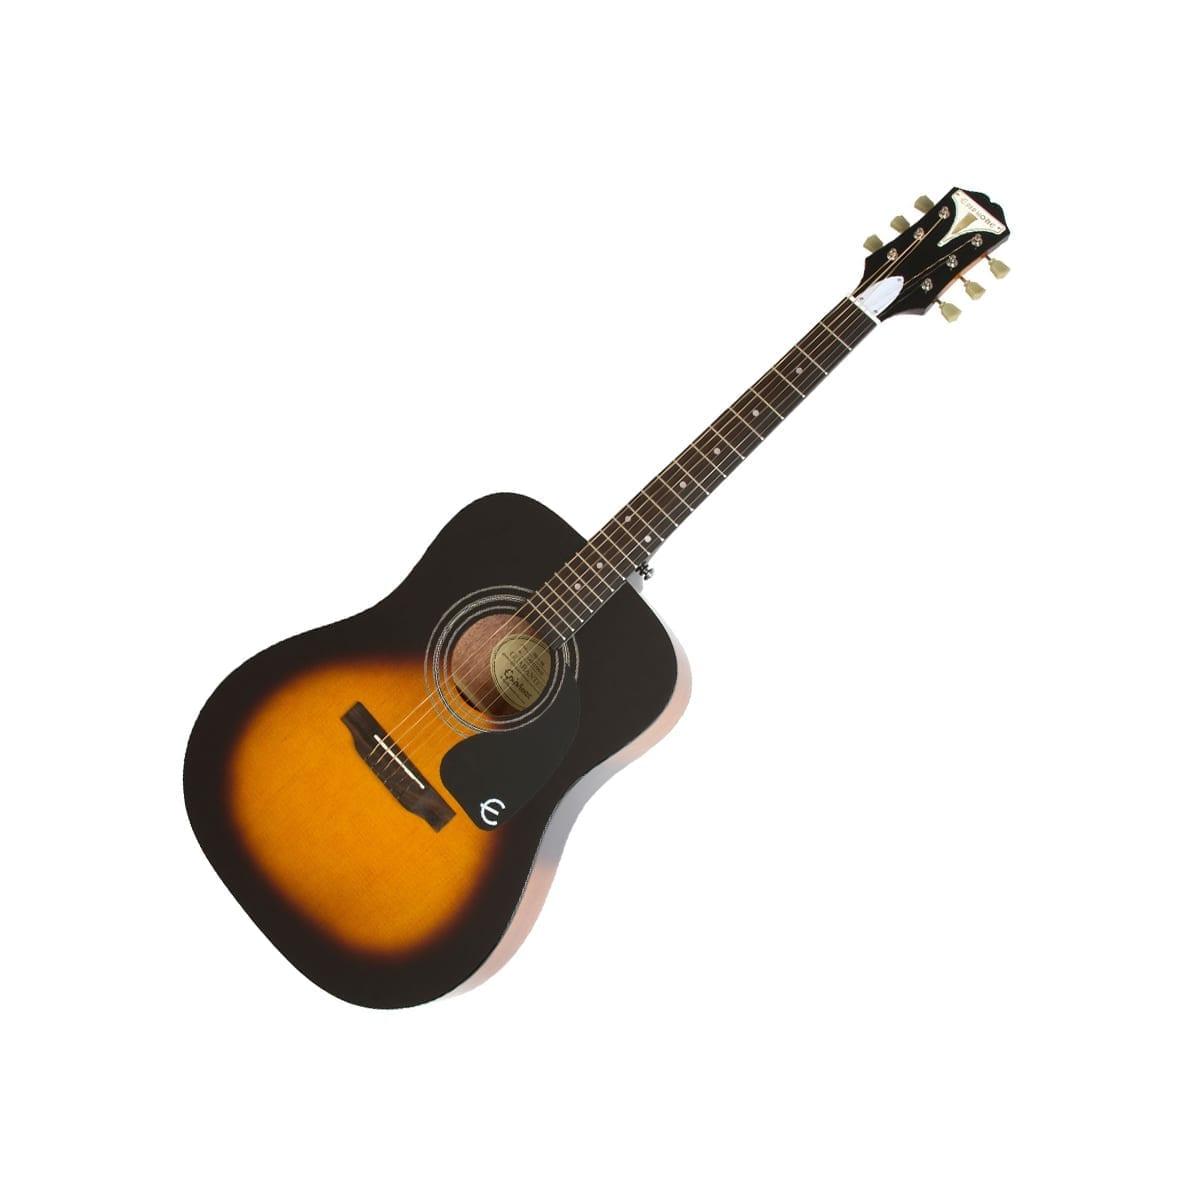 Epiphone Pro 1 Acoustic Vintage Sunburst